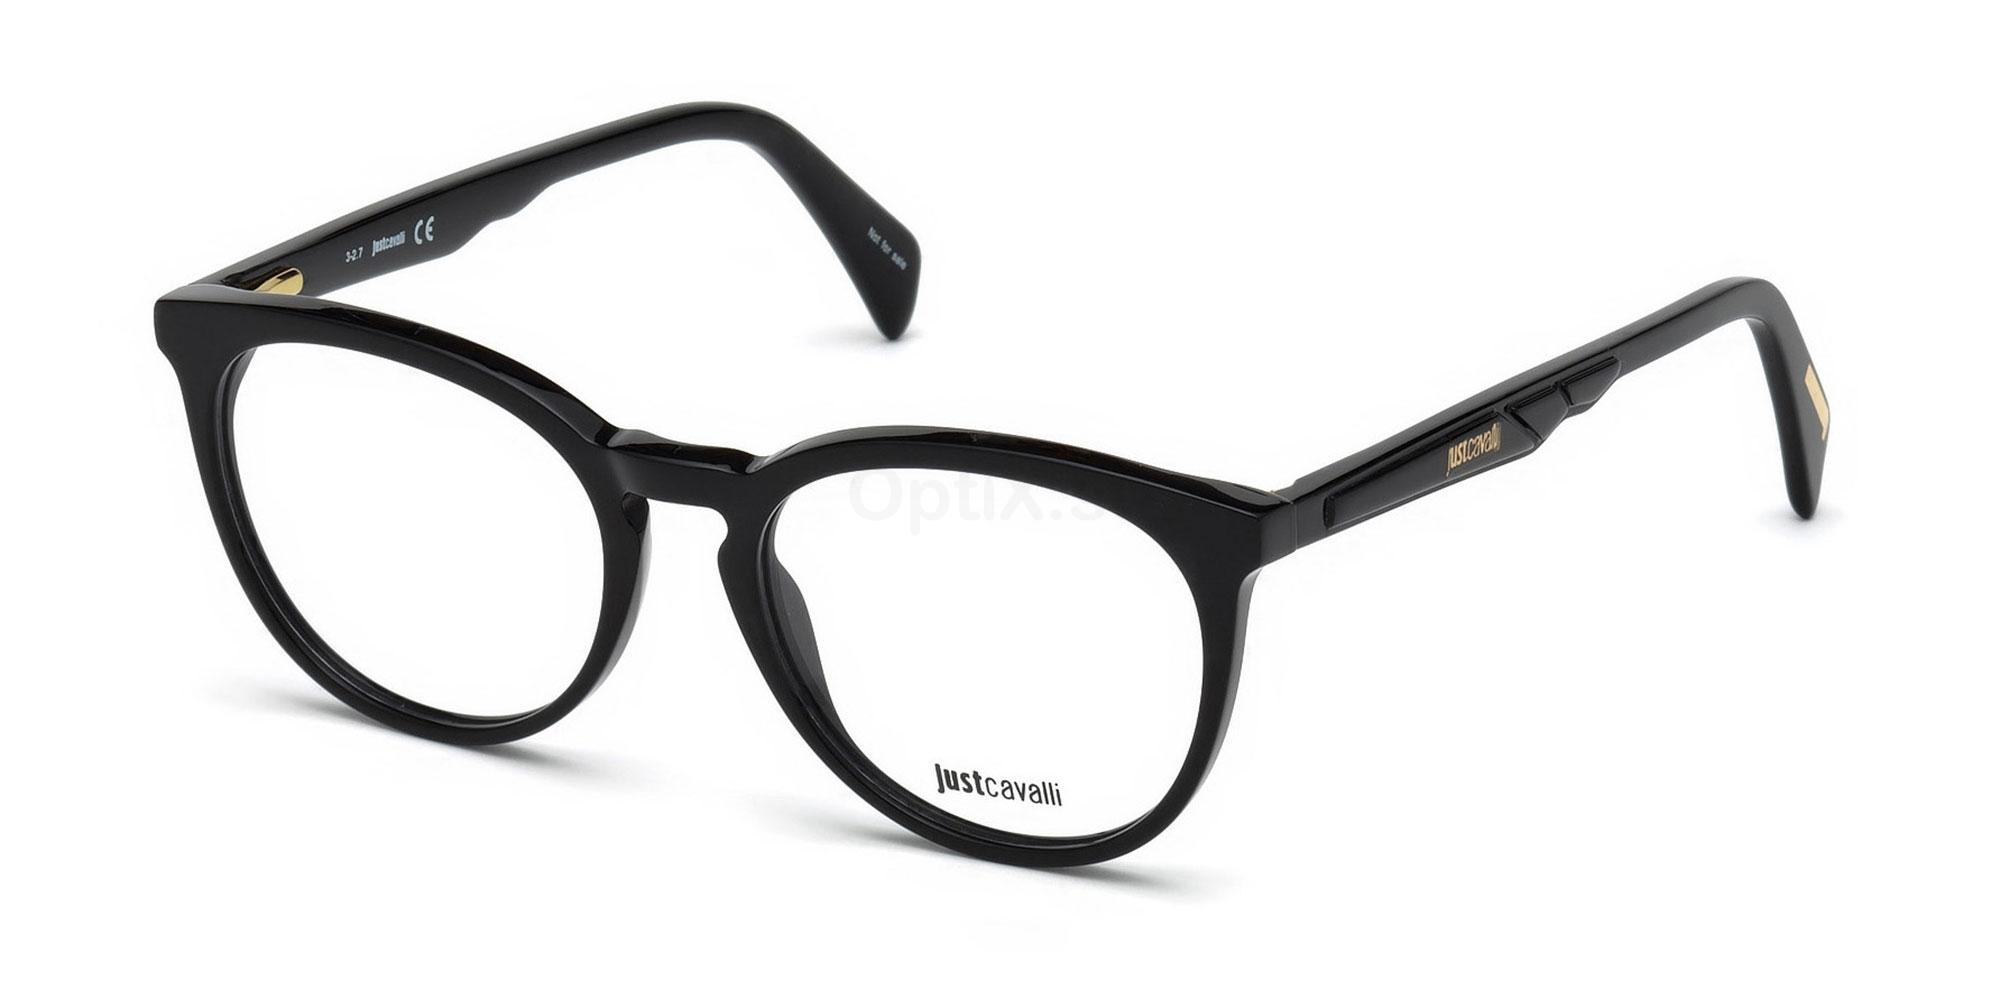 001 JC0847 Glasses, Just Cavalli